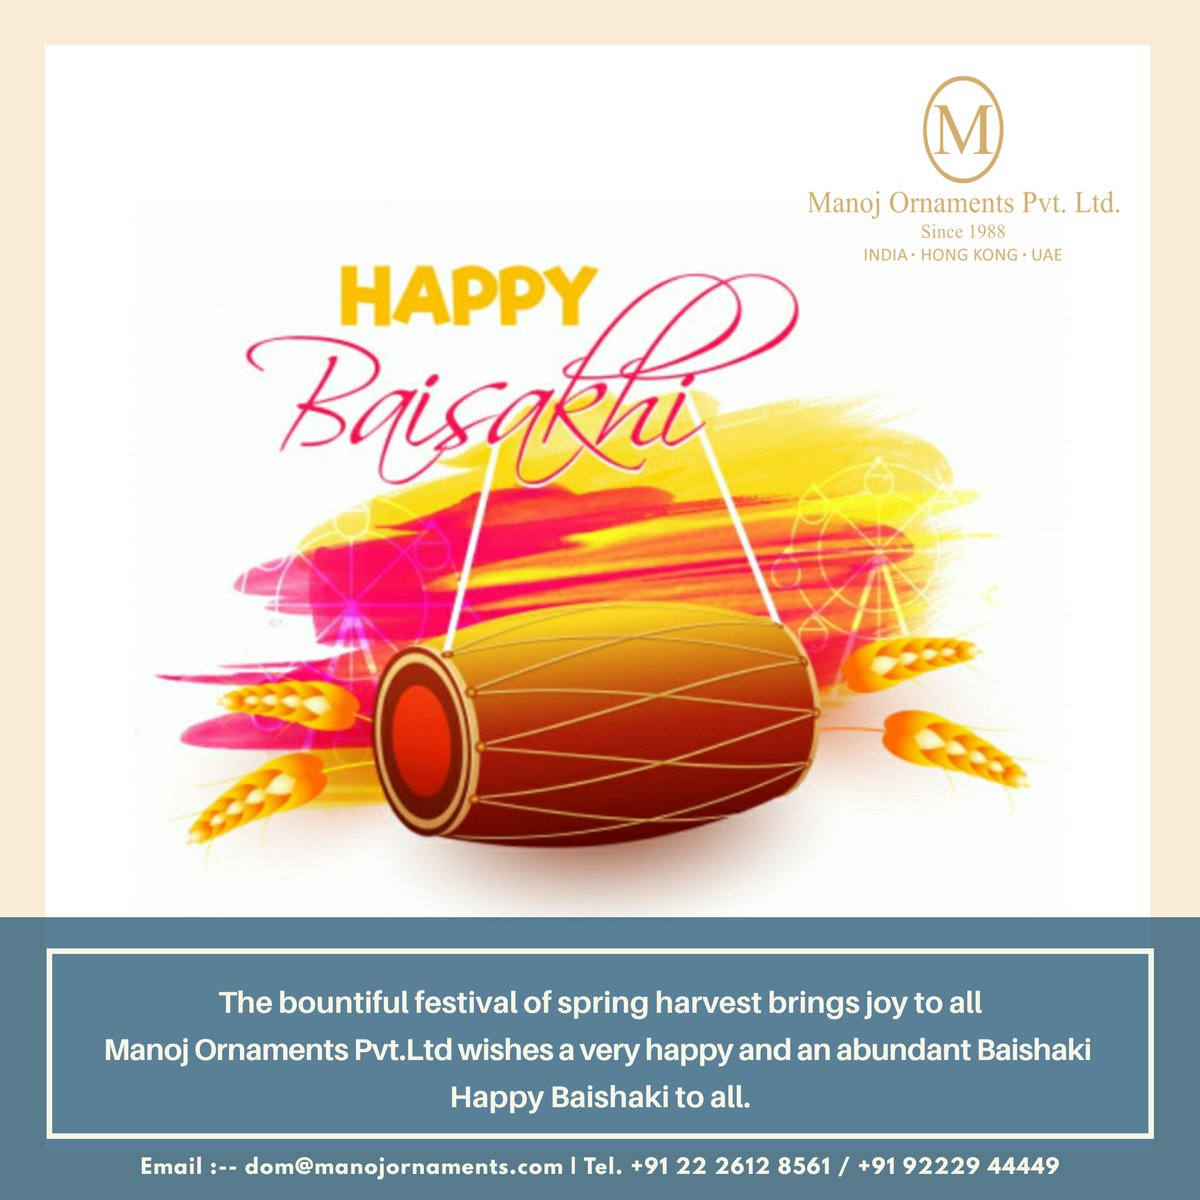 Manoj Ornaments Pvt Ltd  #Mumbai   #Hongkong   #Dubai    #Baisakhi #HappyBaisakhi #ManojOrnamentsPvtLtd #indianjewellery #indianjewelleryusa #indianbridaljewellery #modernjewellerydesign #contemproryjewellery #handmadejewelrydesigner #jewelleryaddict #indianfestival